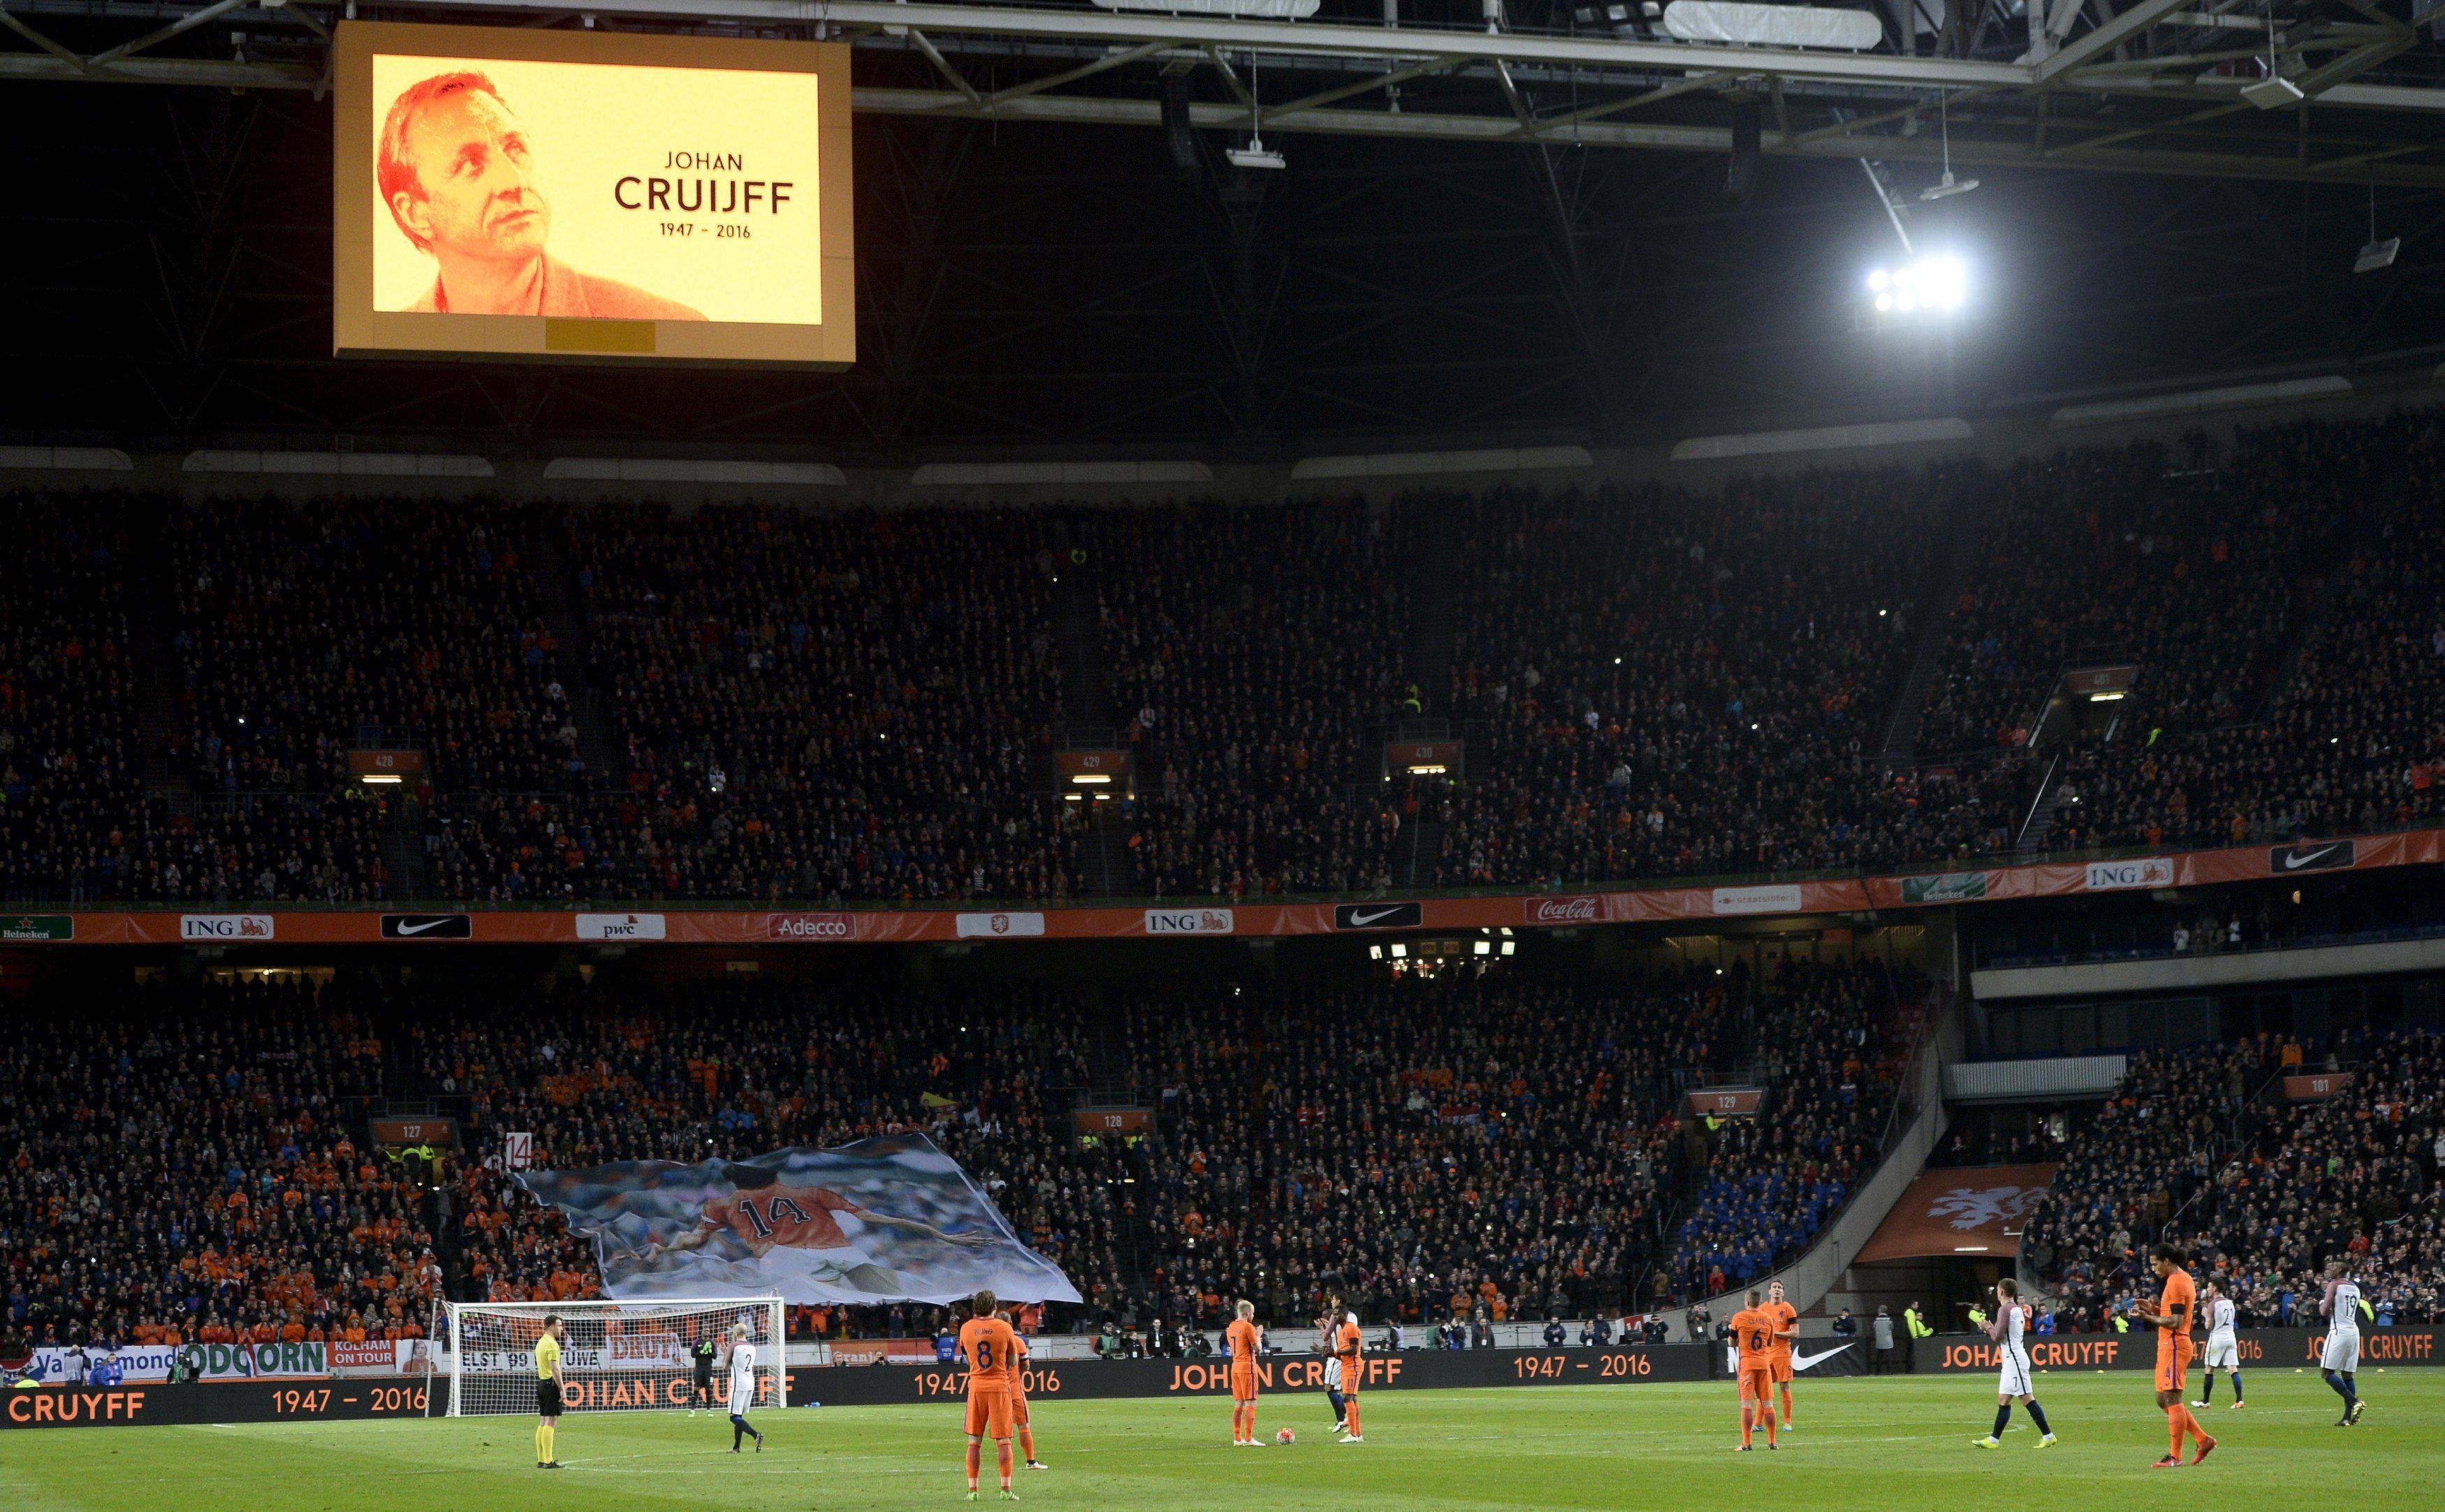 Минута молчания на матче Нидерланды - Франция